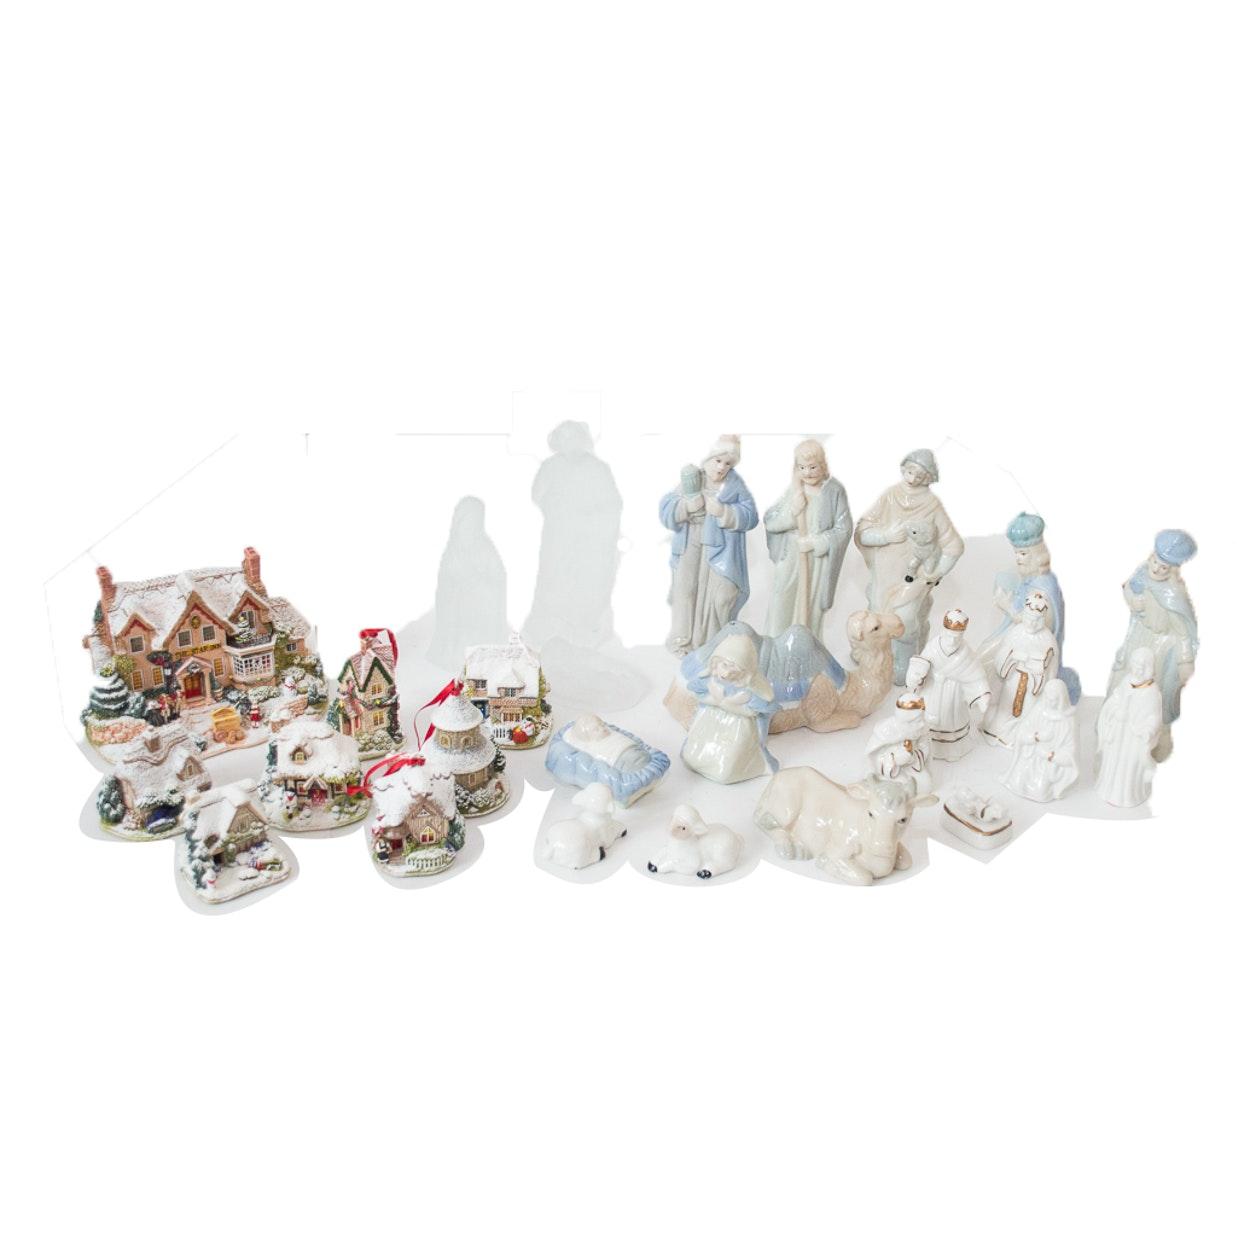 Lilliput Lane Christmas and Nativity Sets